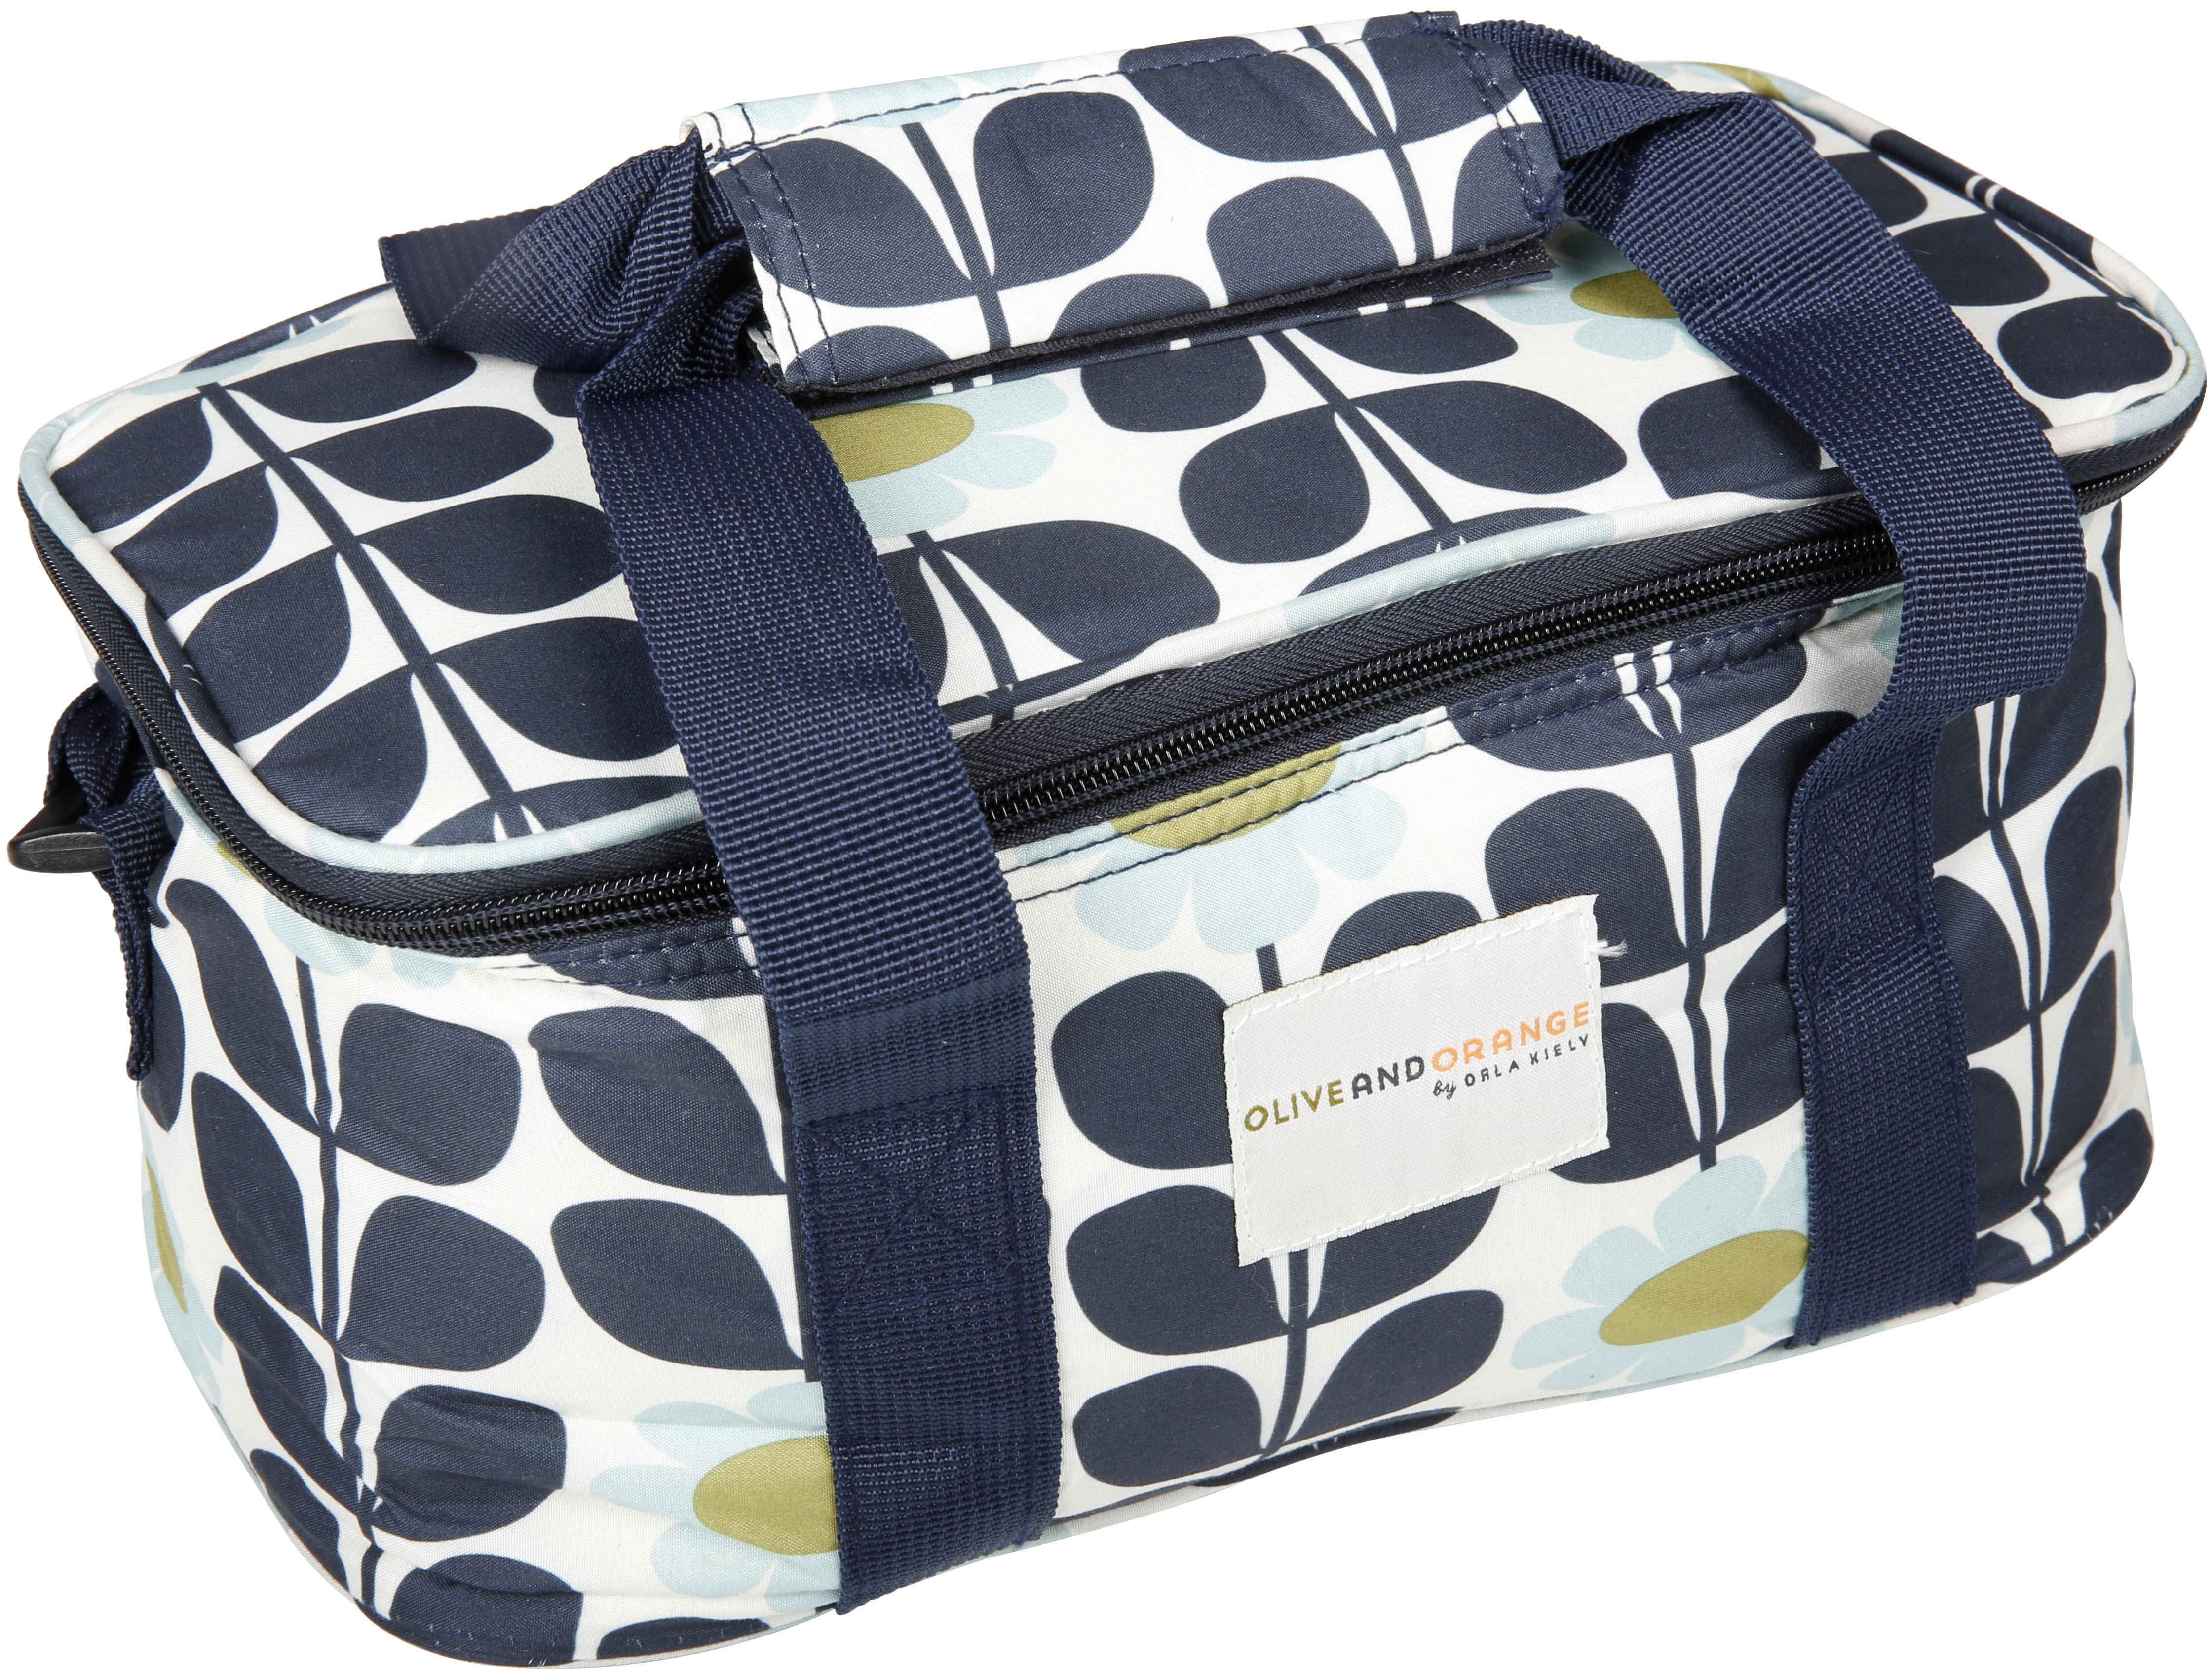 Orla Kiely Vintage Camping Garden Picnic 6l Cool Cooler Bag Box Tall Clutch Black